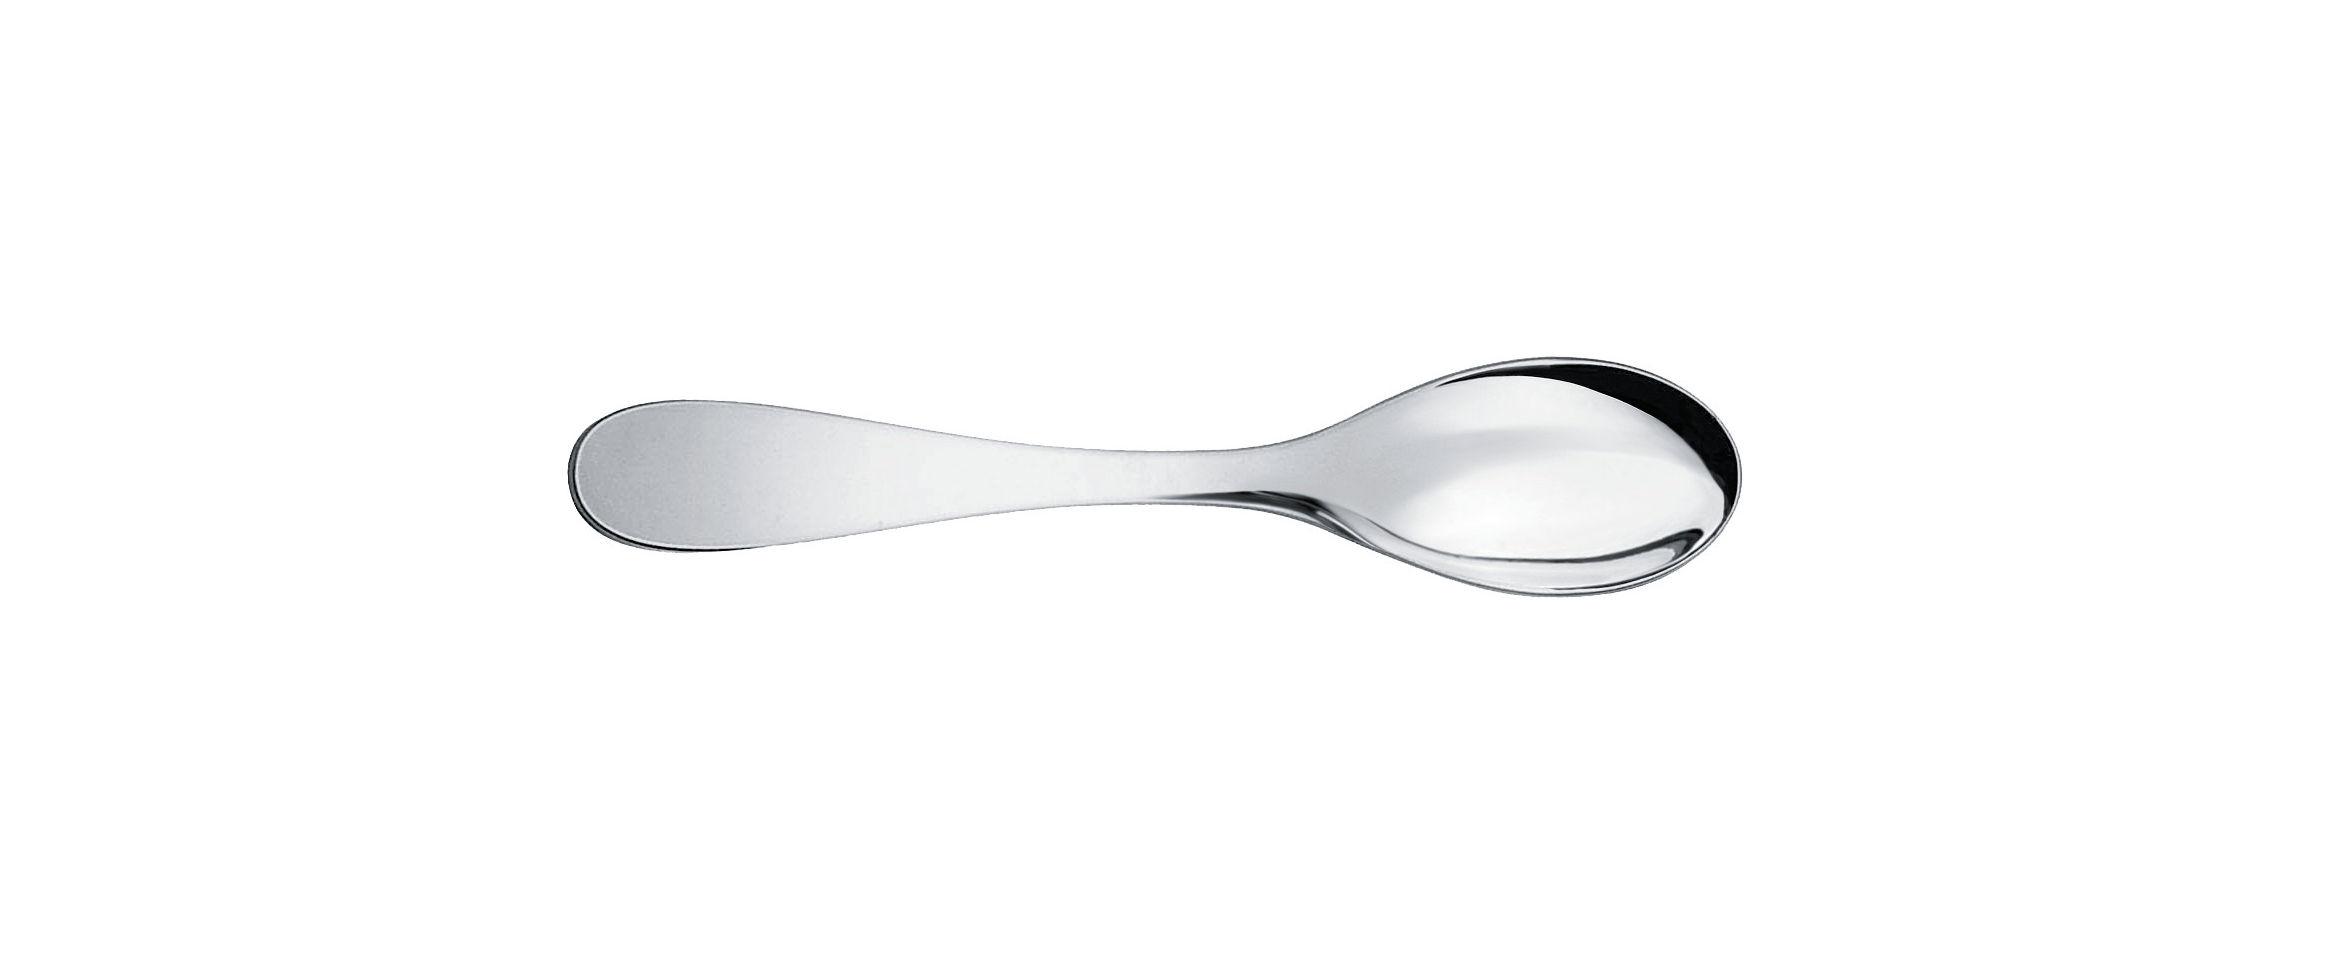 Tavola - Posate - Cucchiaio da caffé Eat.it di Alessi - Caffè / L 12,7 cm - Acier inoxydable 18/10